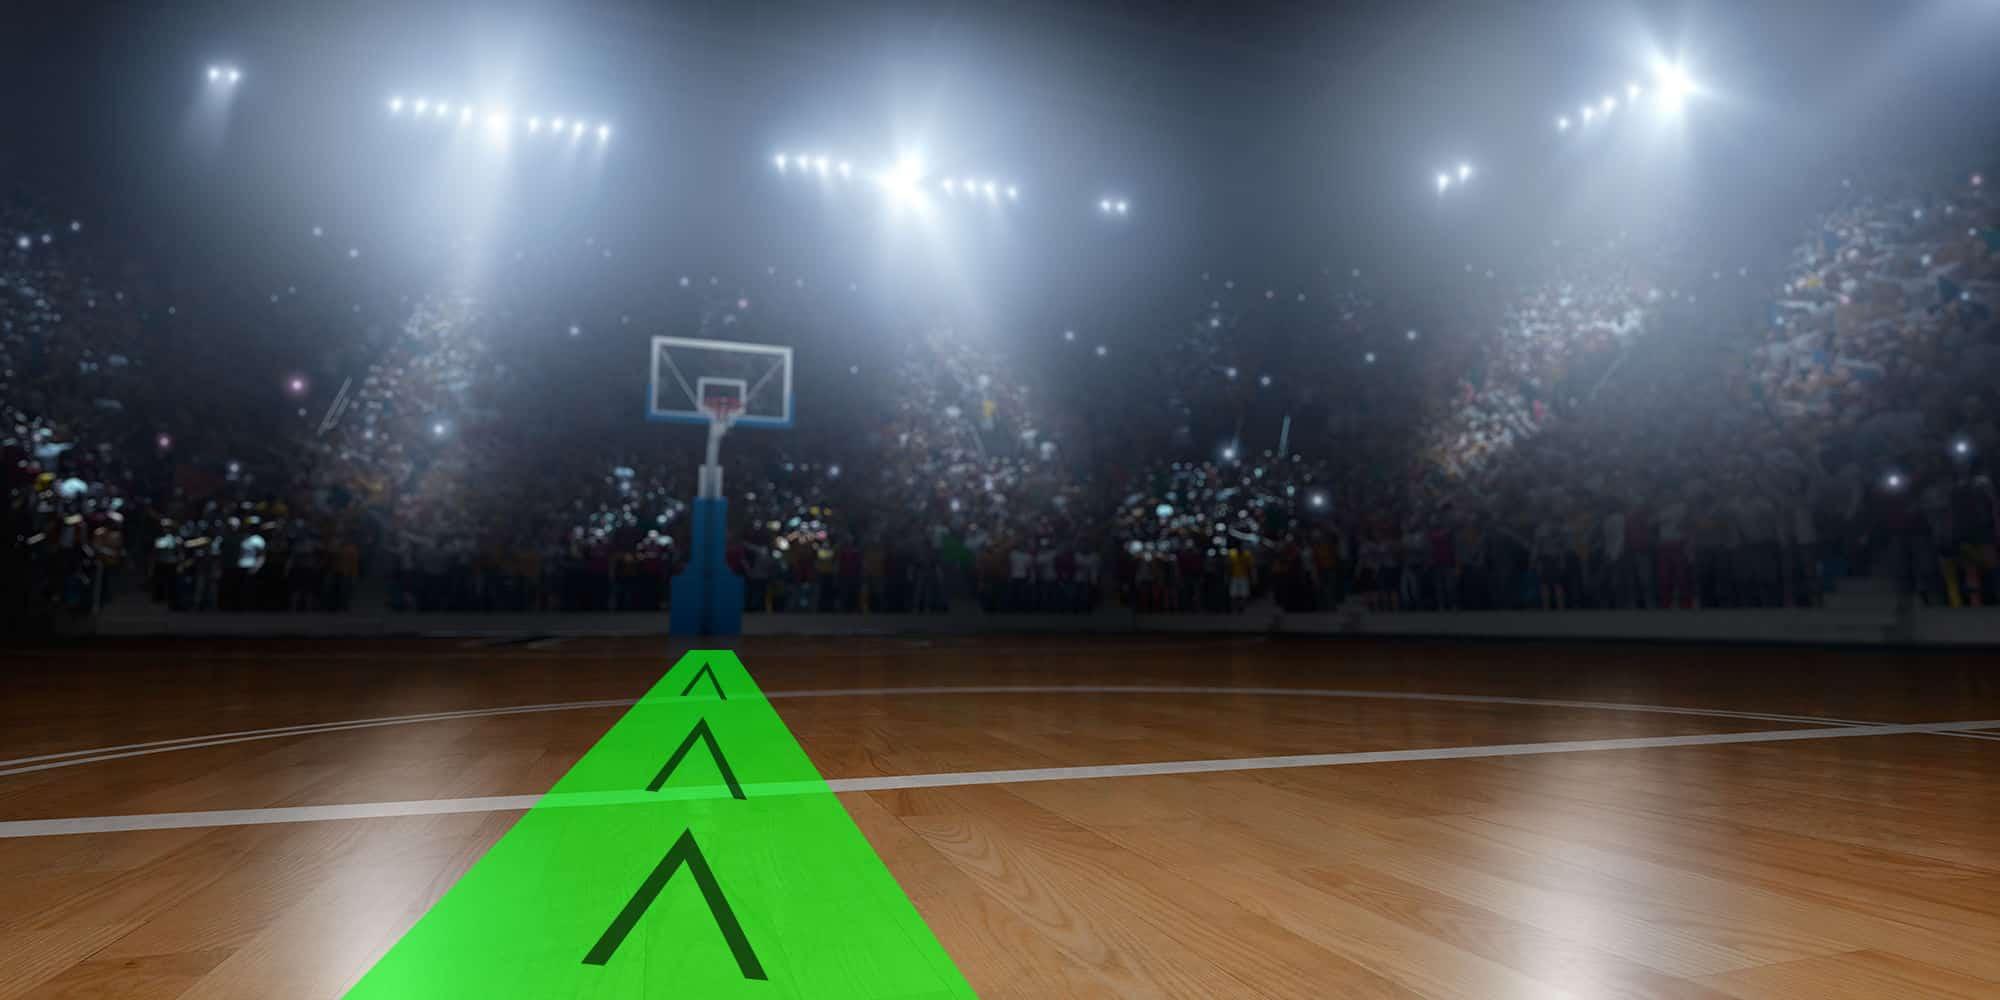 clear path rule in basketball